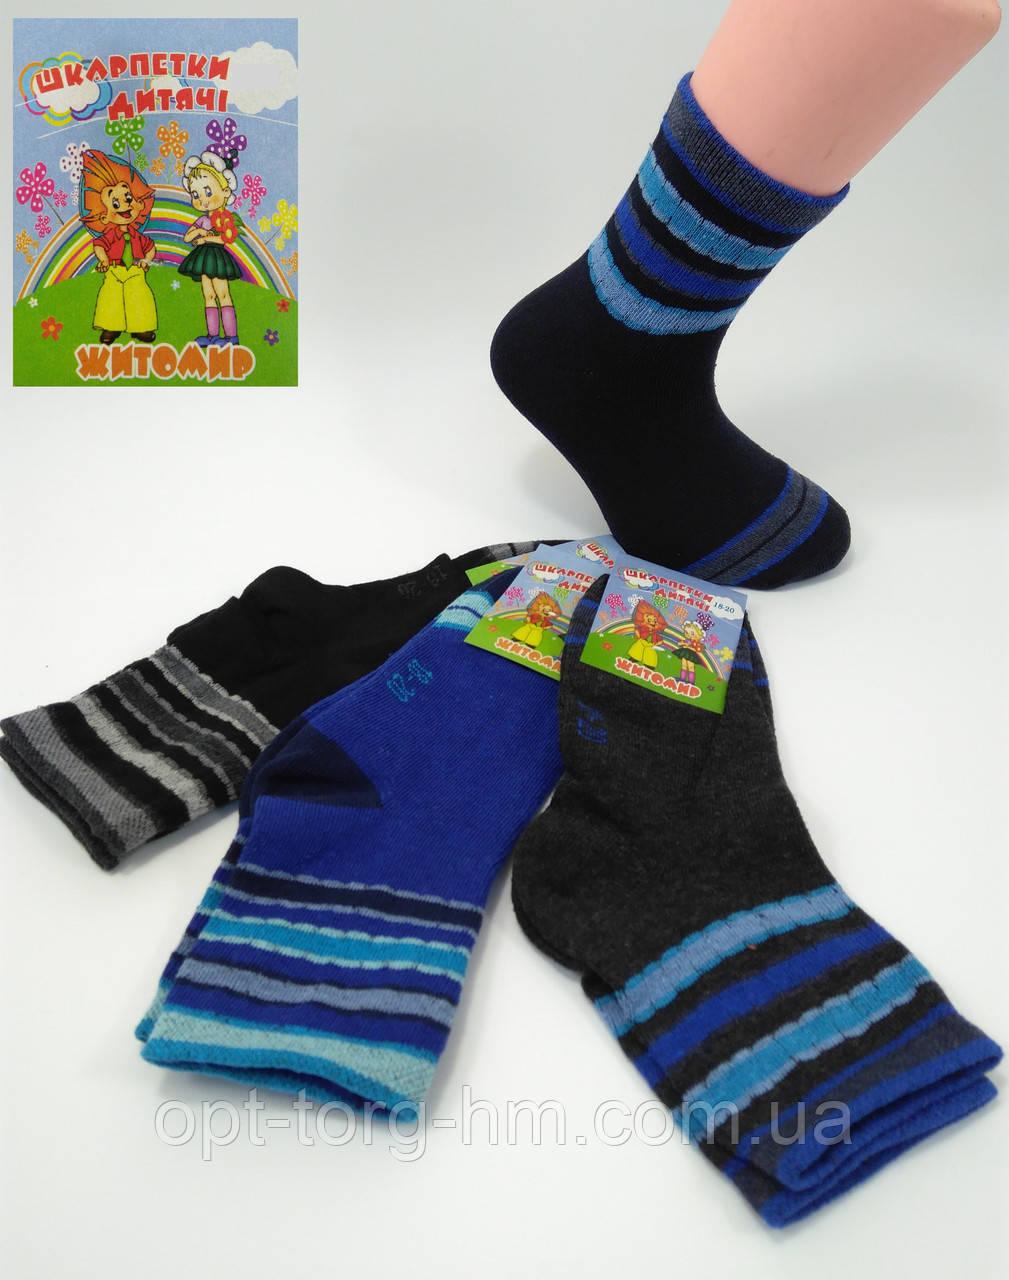 Детские носки 18-20 (28-32 обувь) Микс полоска